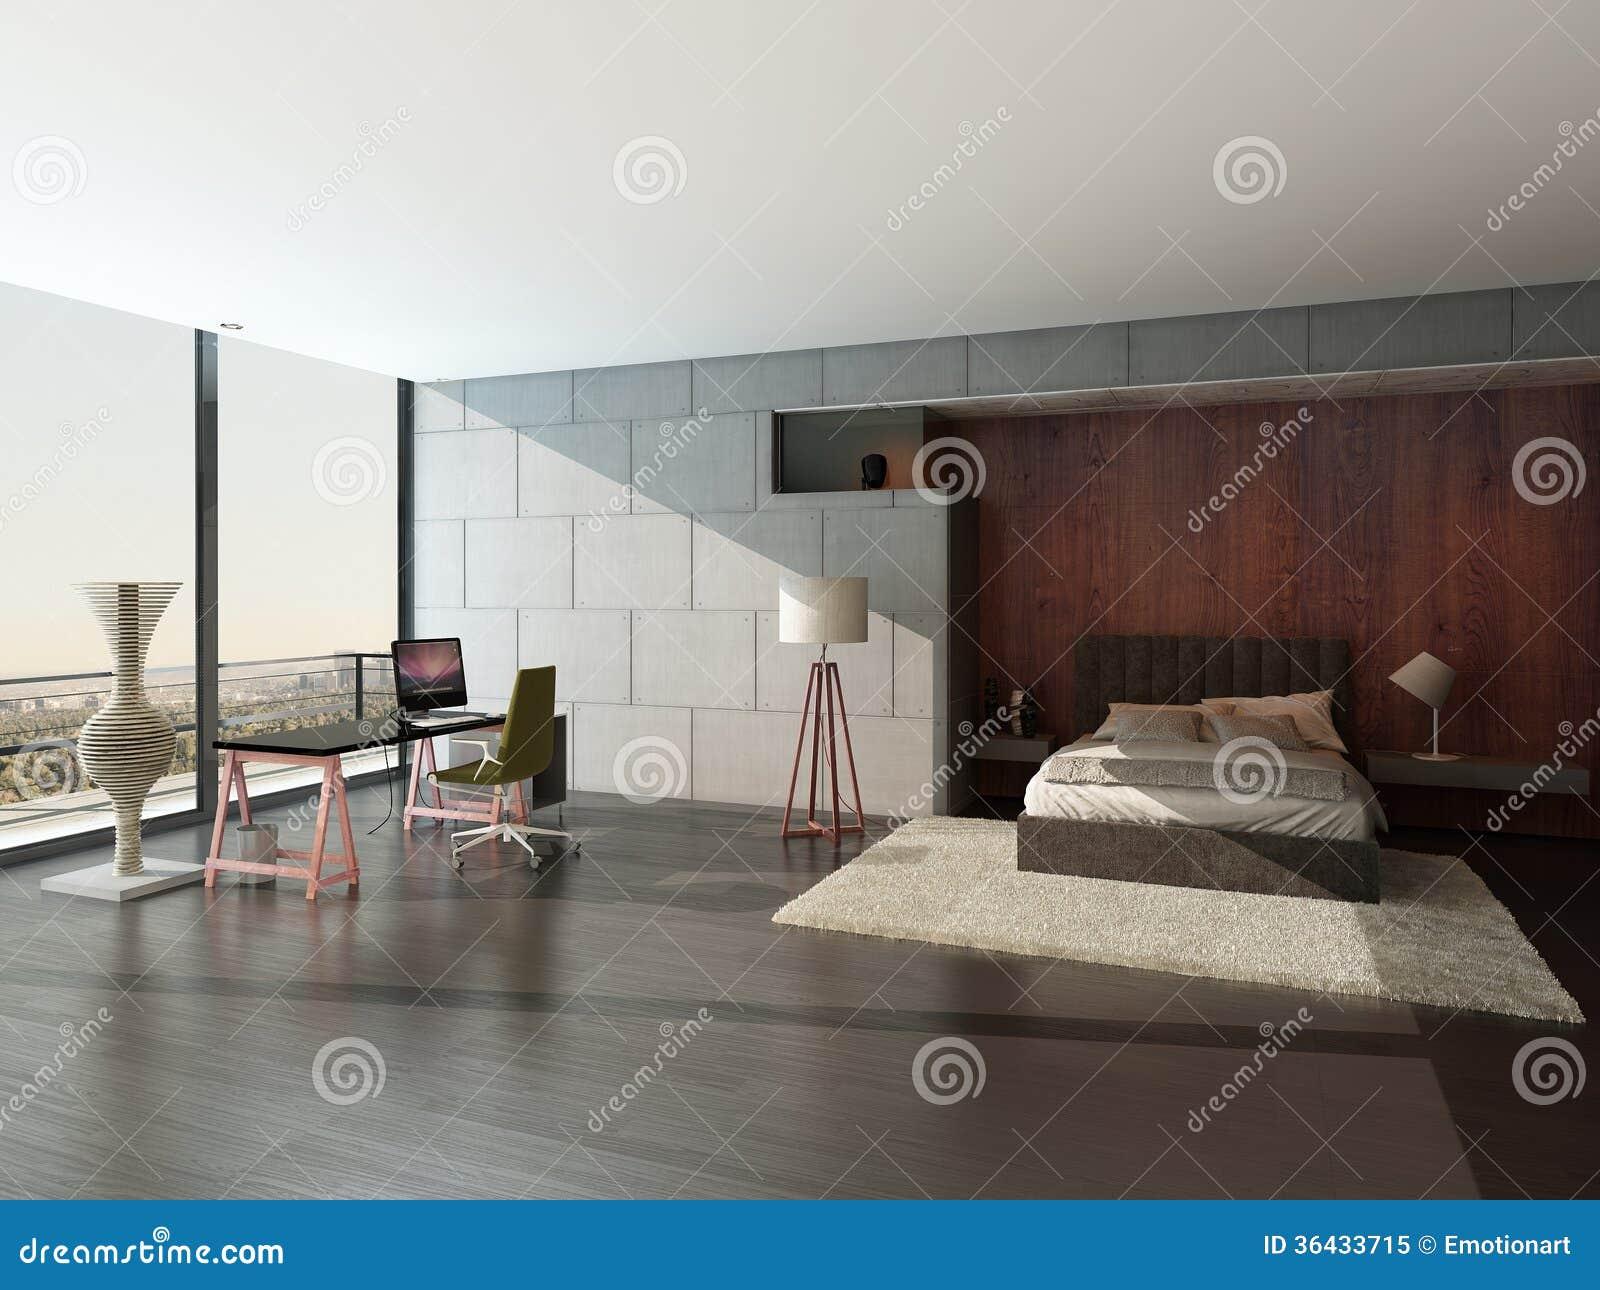 Chambre avec mur en pierre stunning idees d chambre for Chambre a coucher yvette